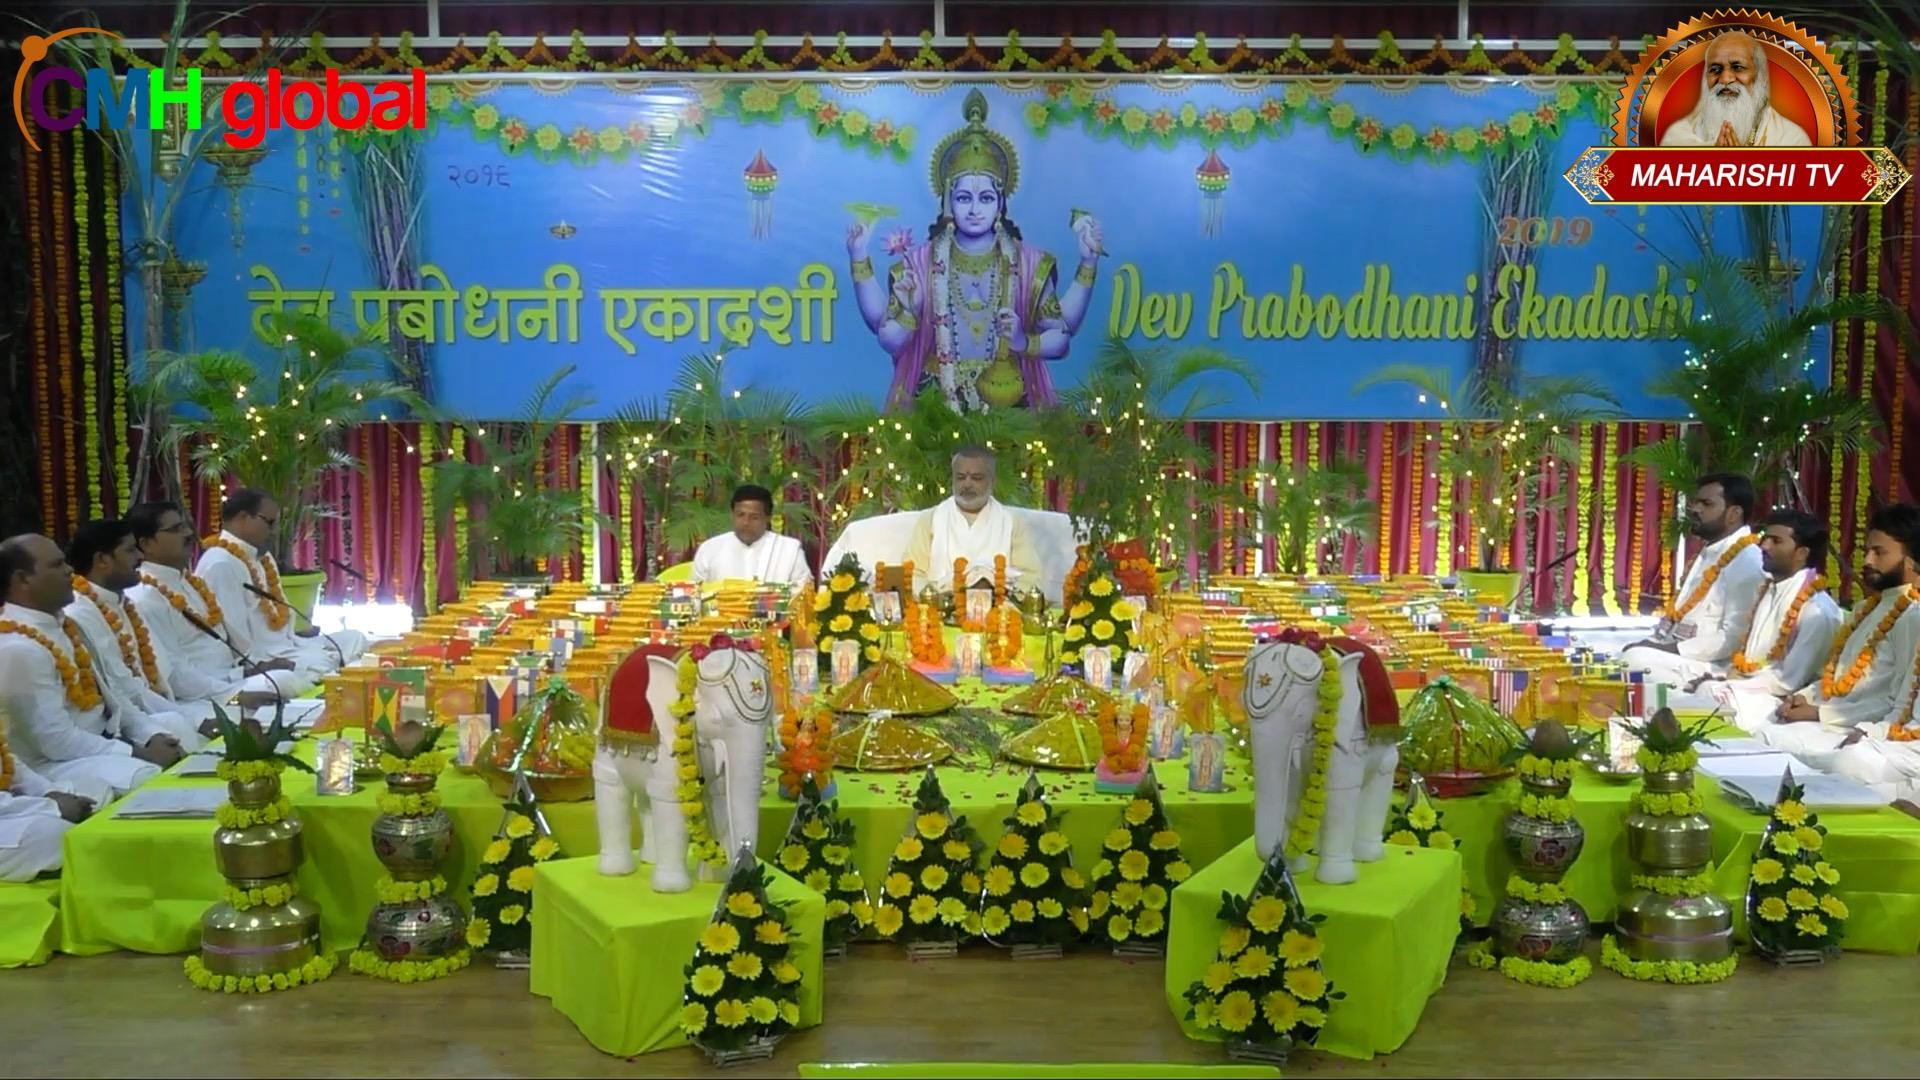 Dev Prabodhani Ekadashi Pujan Ep-06, 2019